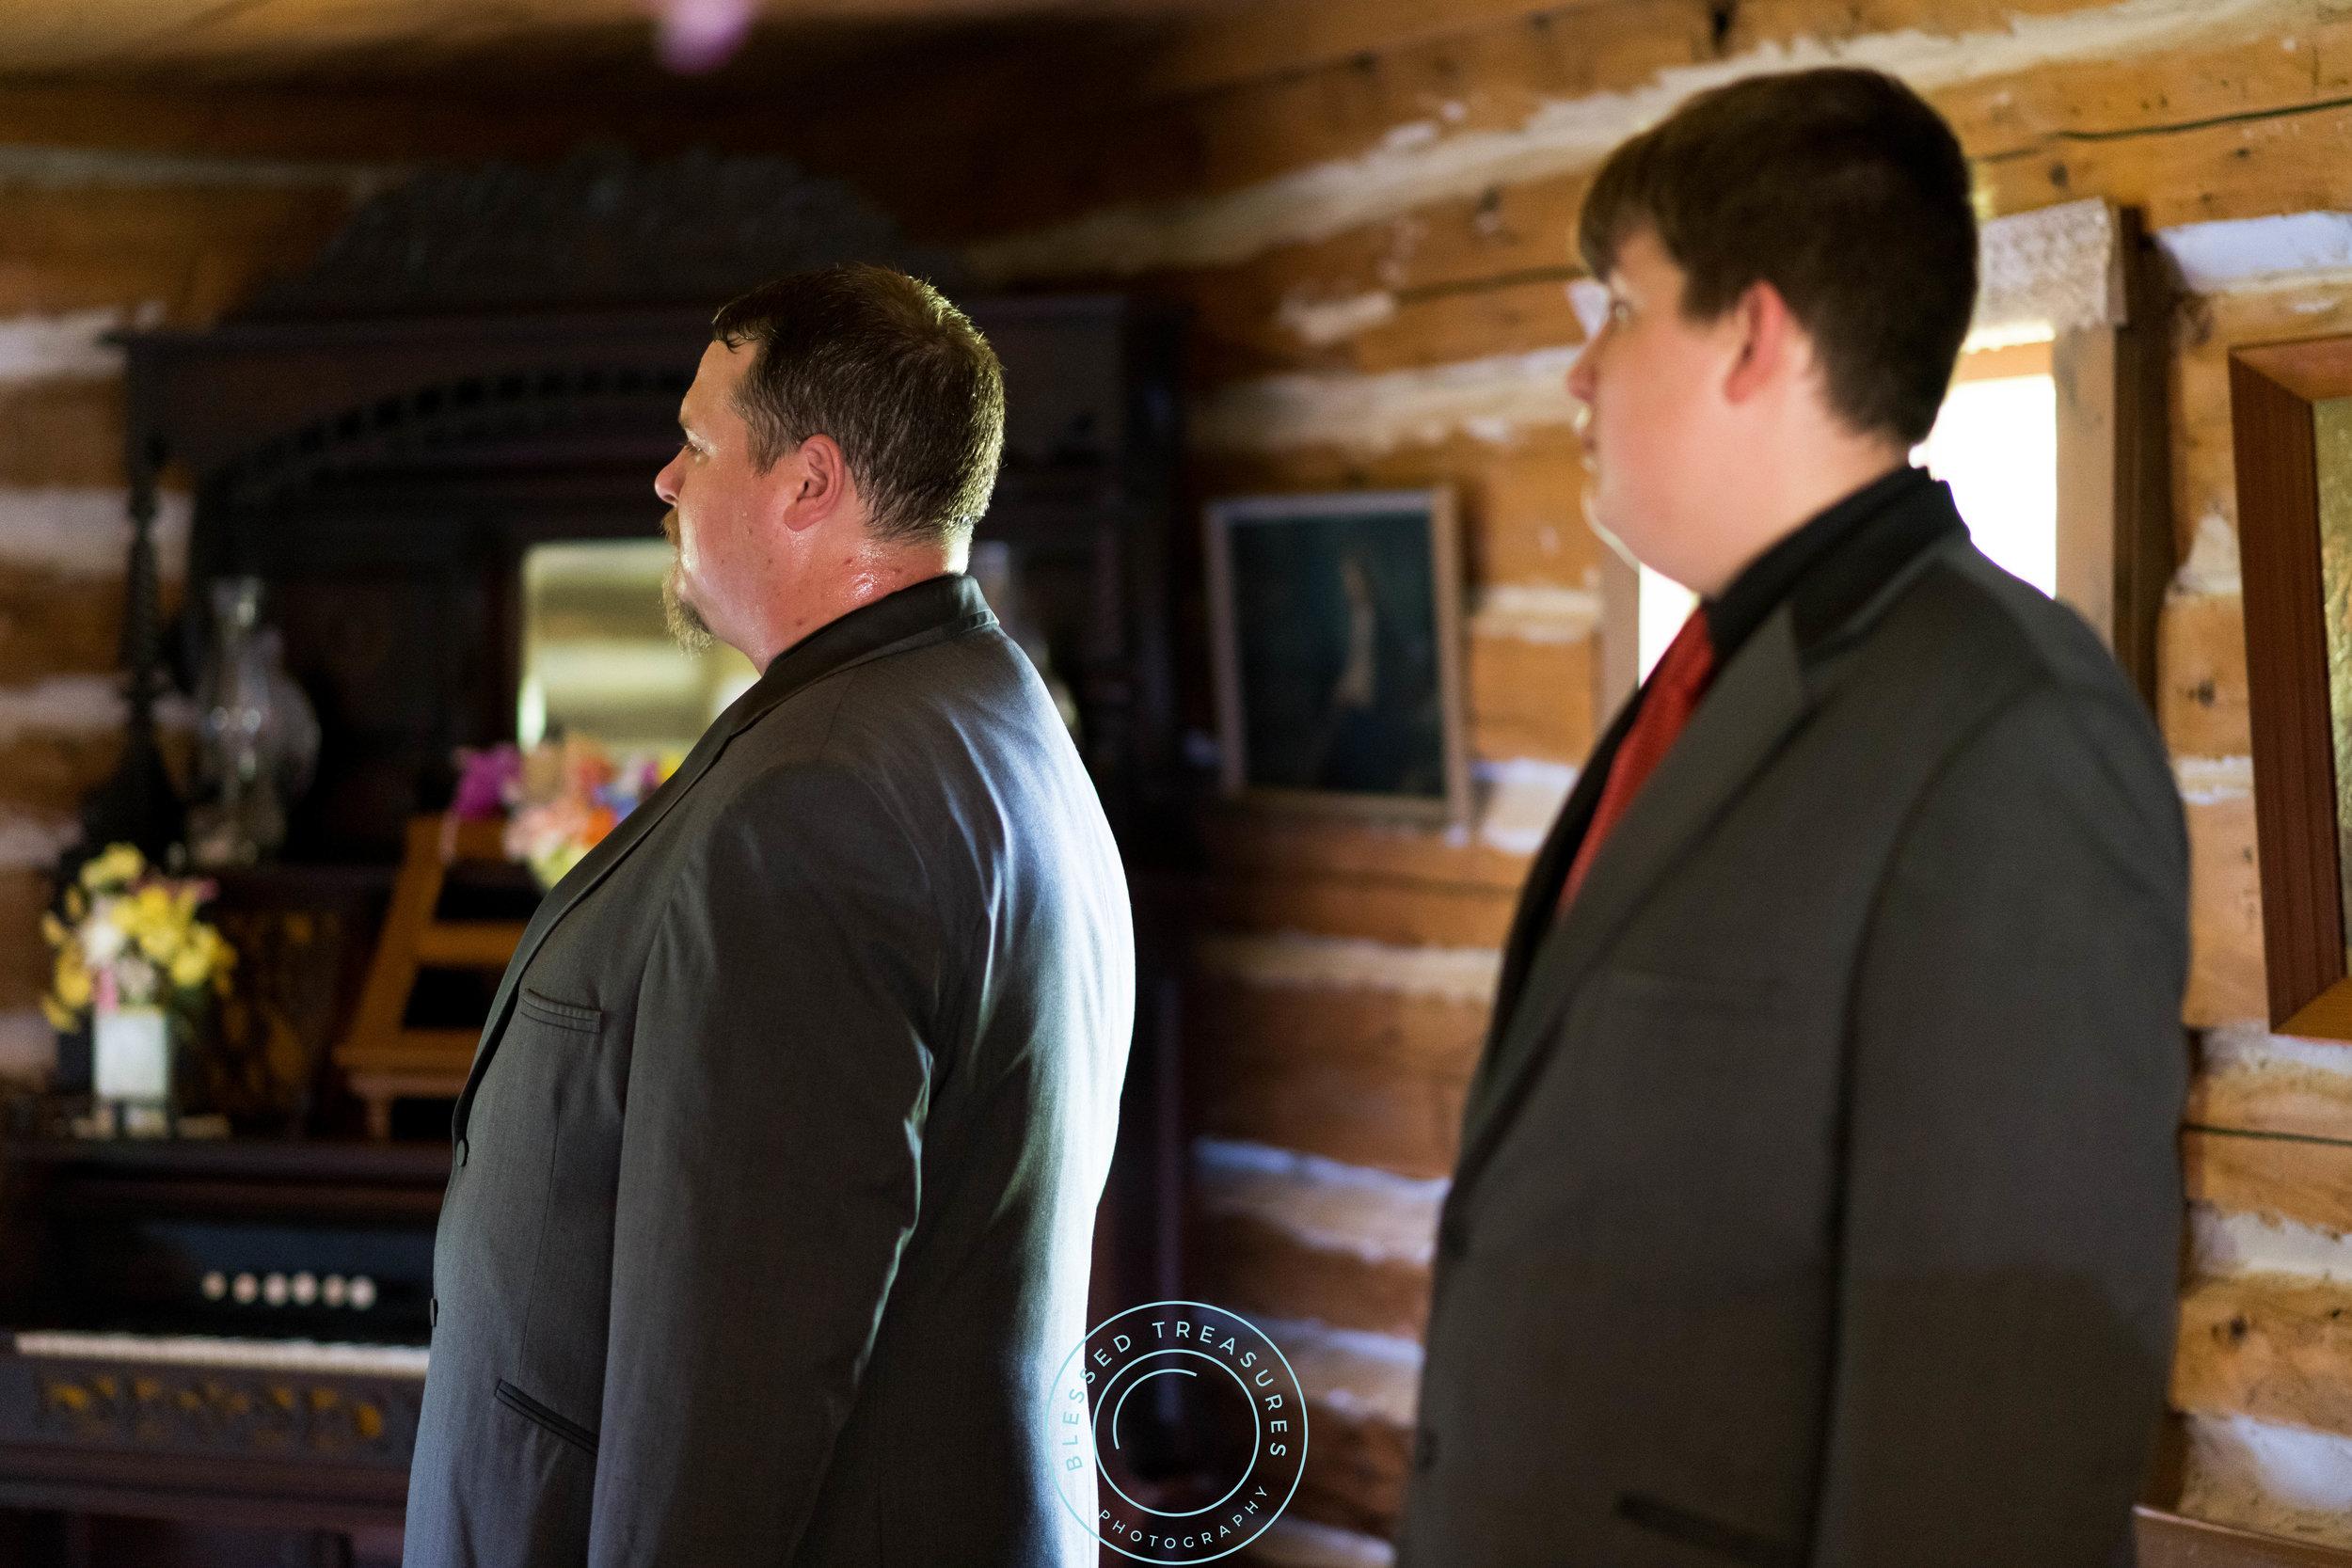 Mansfield township pioneer church crystal falls michigan bride and groom wedding ceremony groomsmen